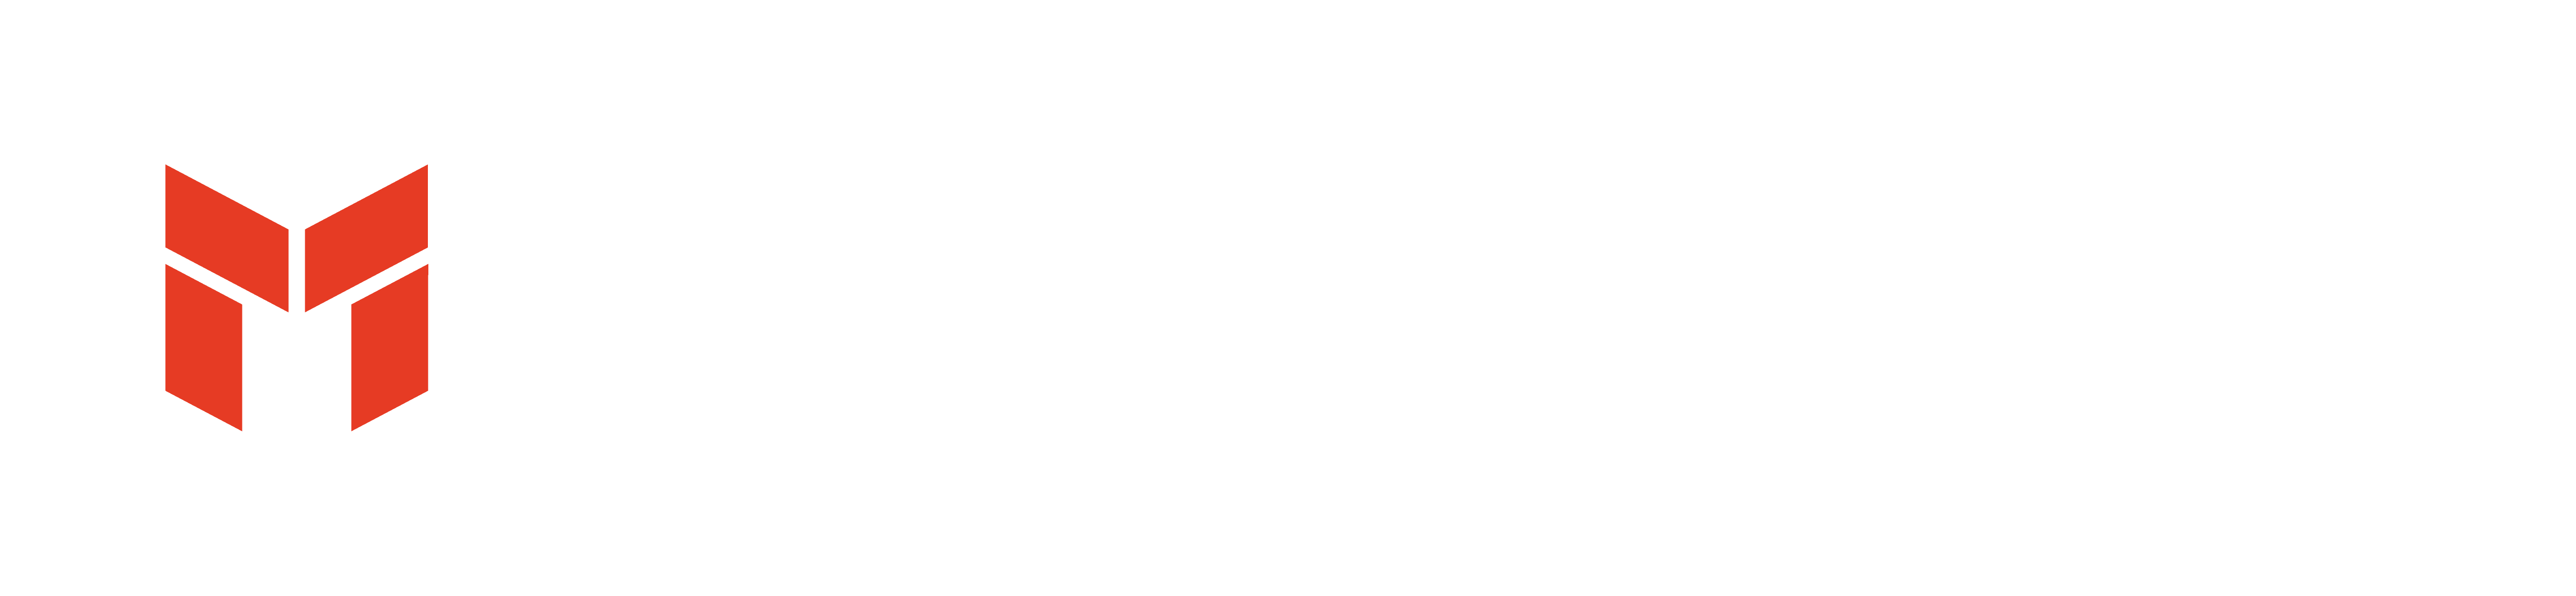 PLO Mastermind Logo